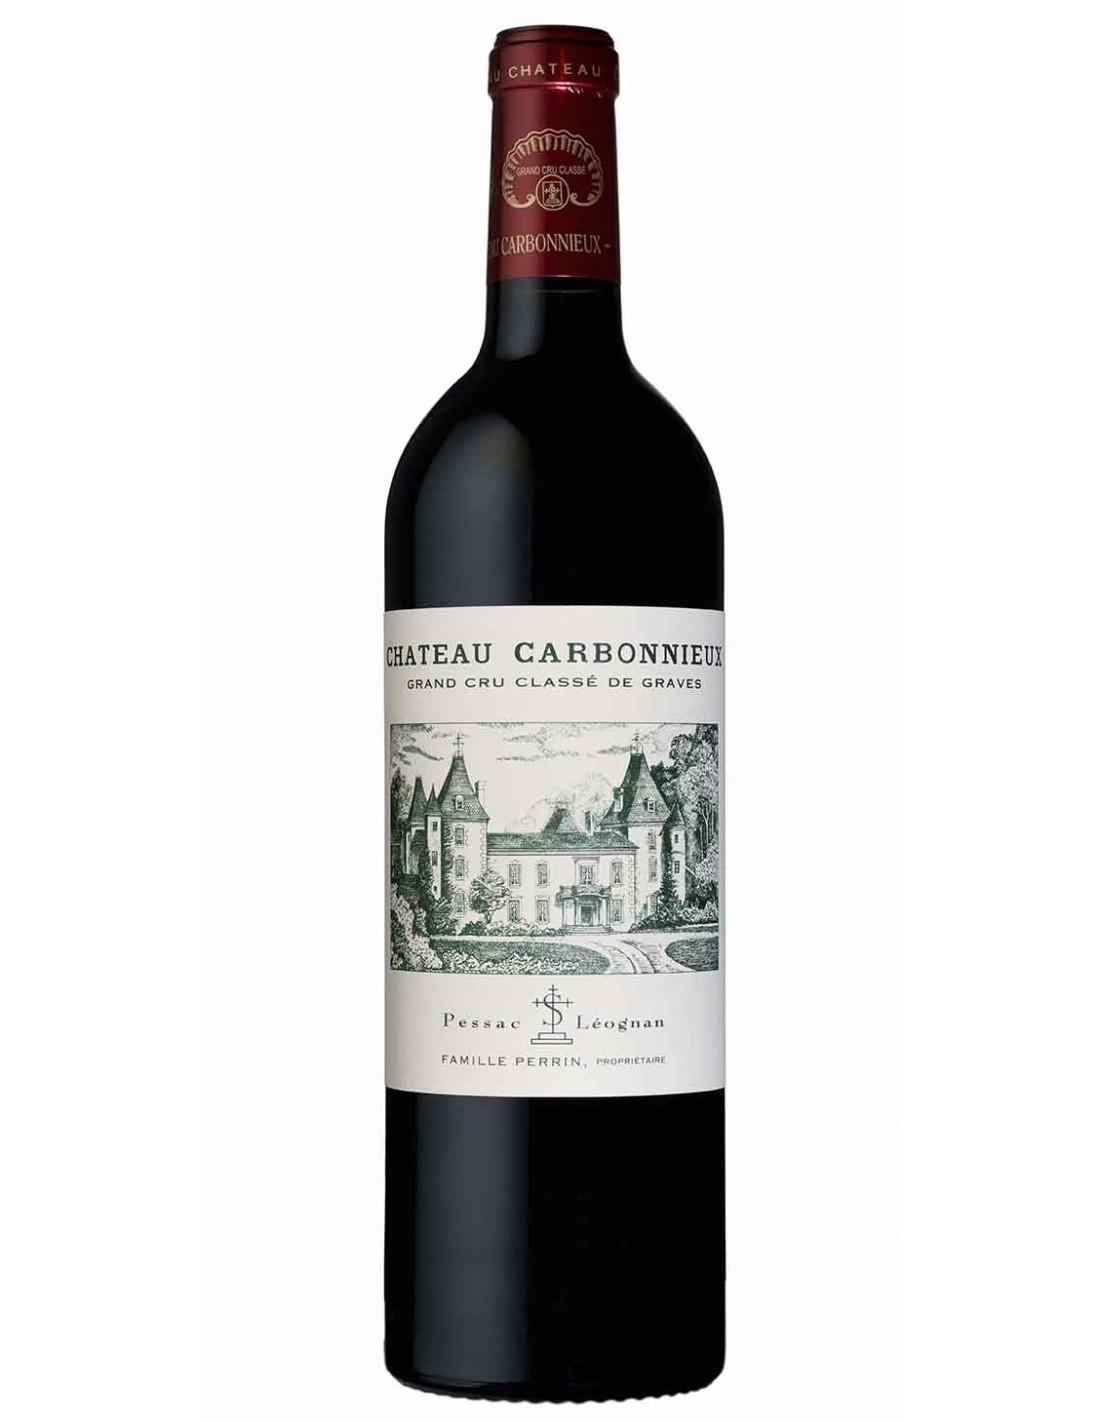 Vin rosu, Cupaj, Chateau Carbonnieux Pessac-Leognan, 0.75L, 13.5% alc., Franta